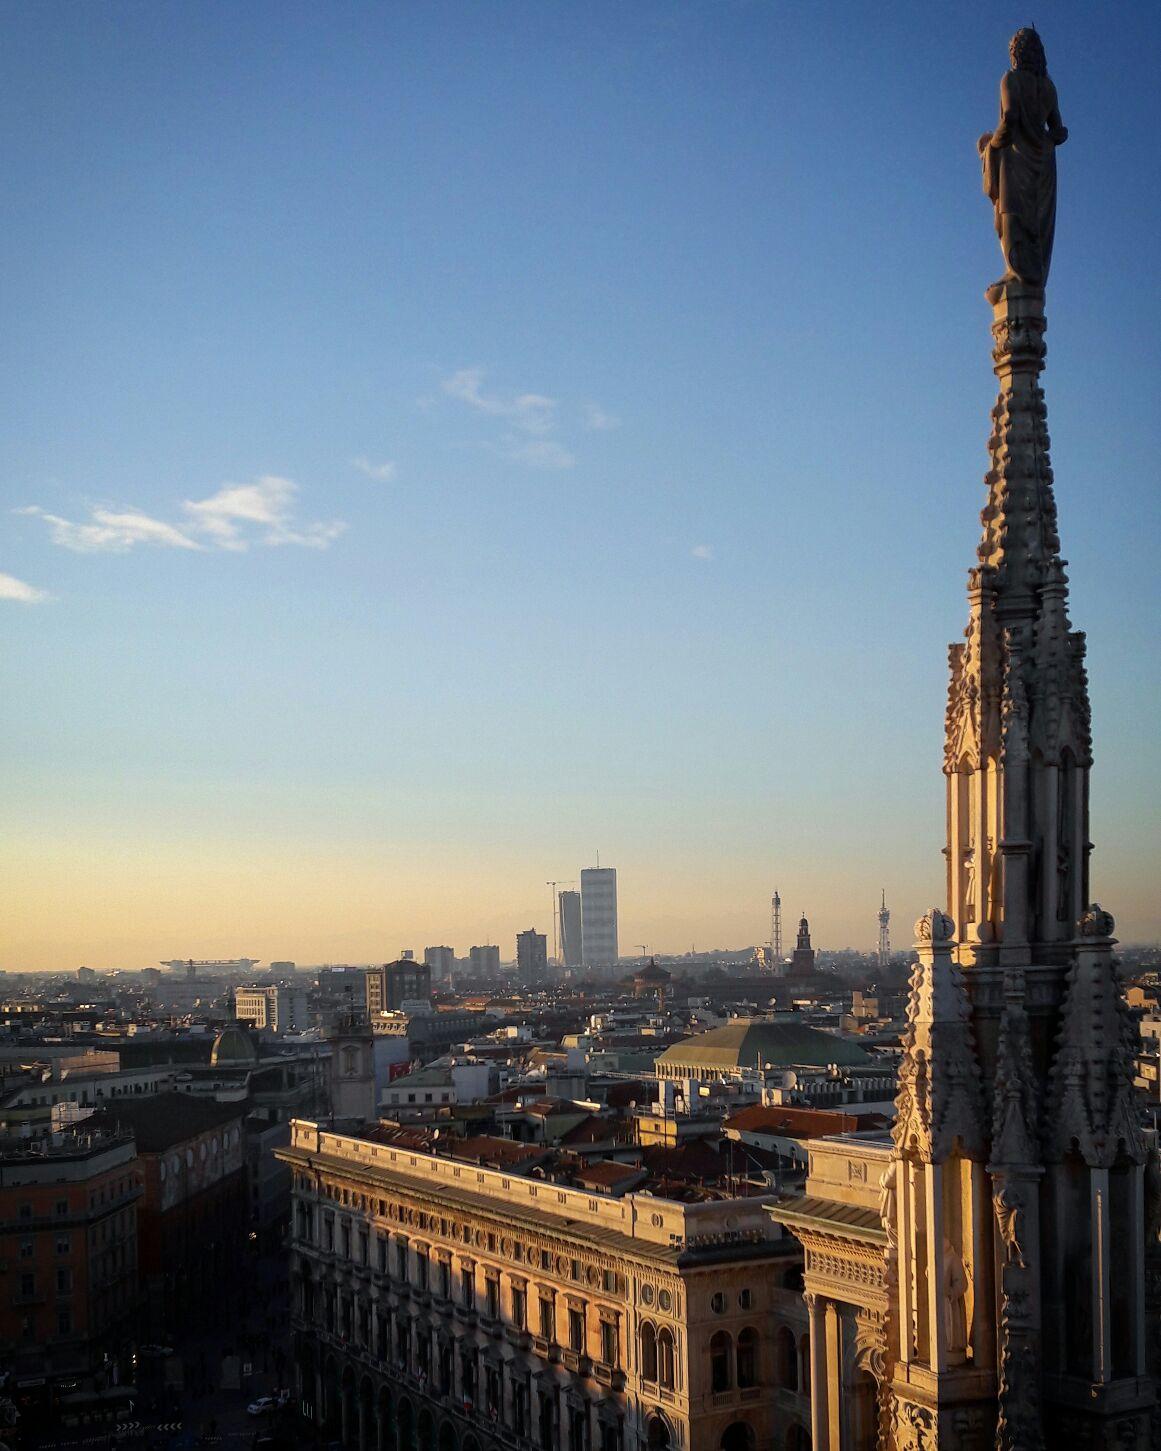 с крыши дуомо - Взгляд на Милан в фотообъектив от Арины Карабановой